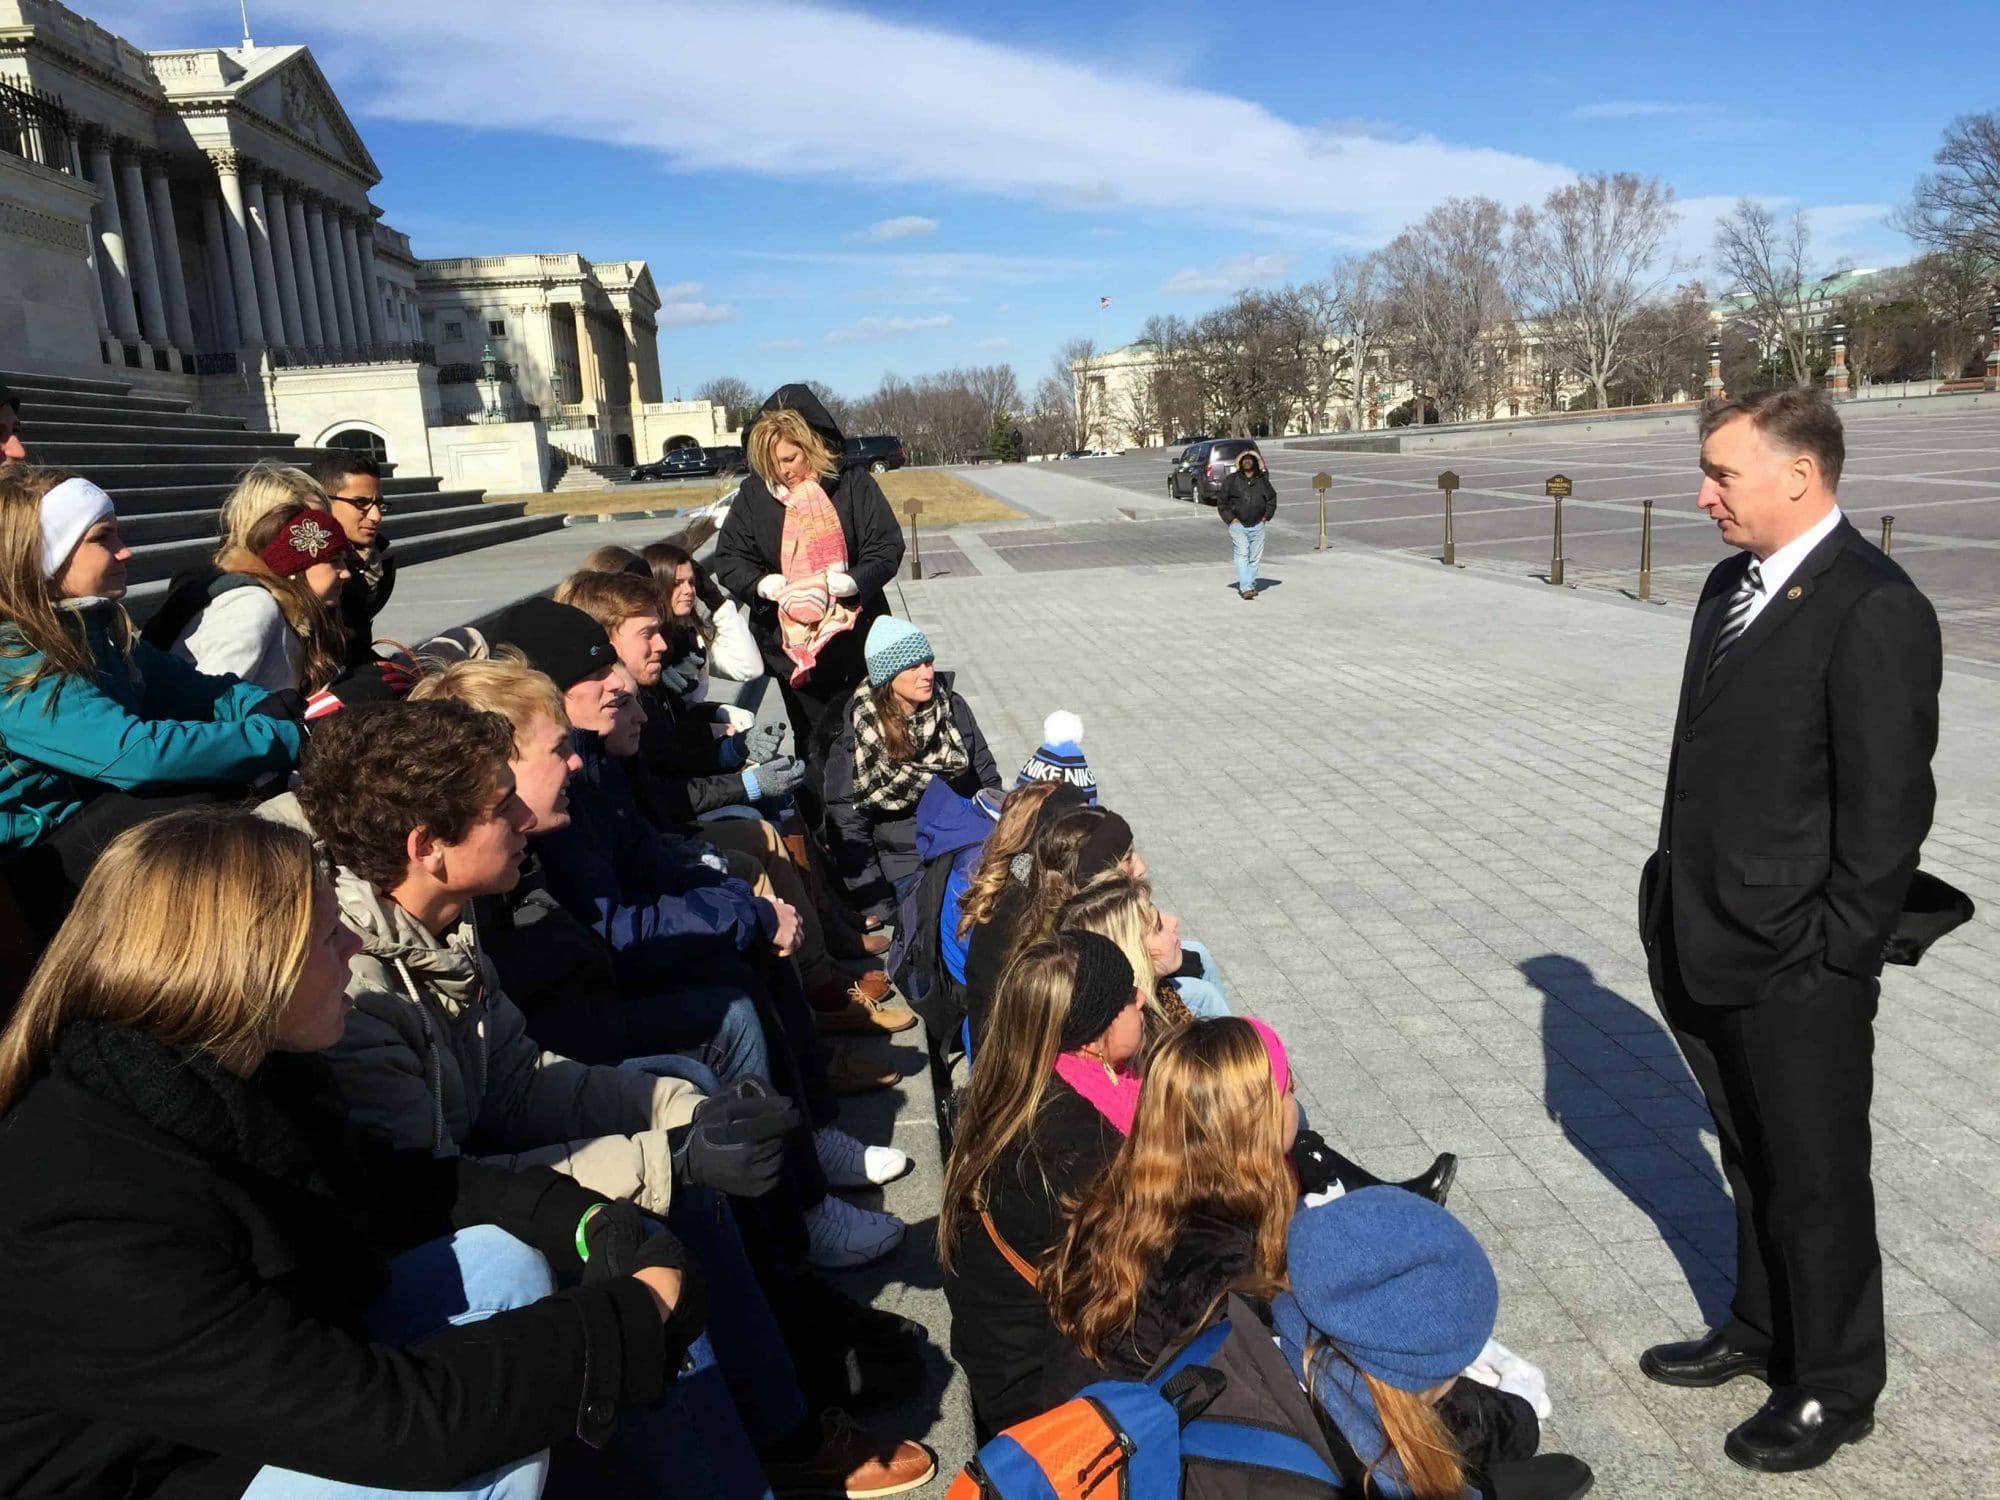 Meet your Congressperson or Senator on your next civics class trip to washington dc